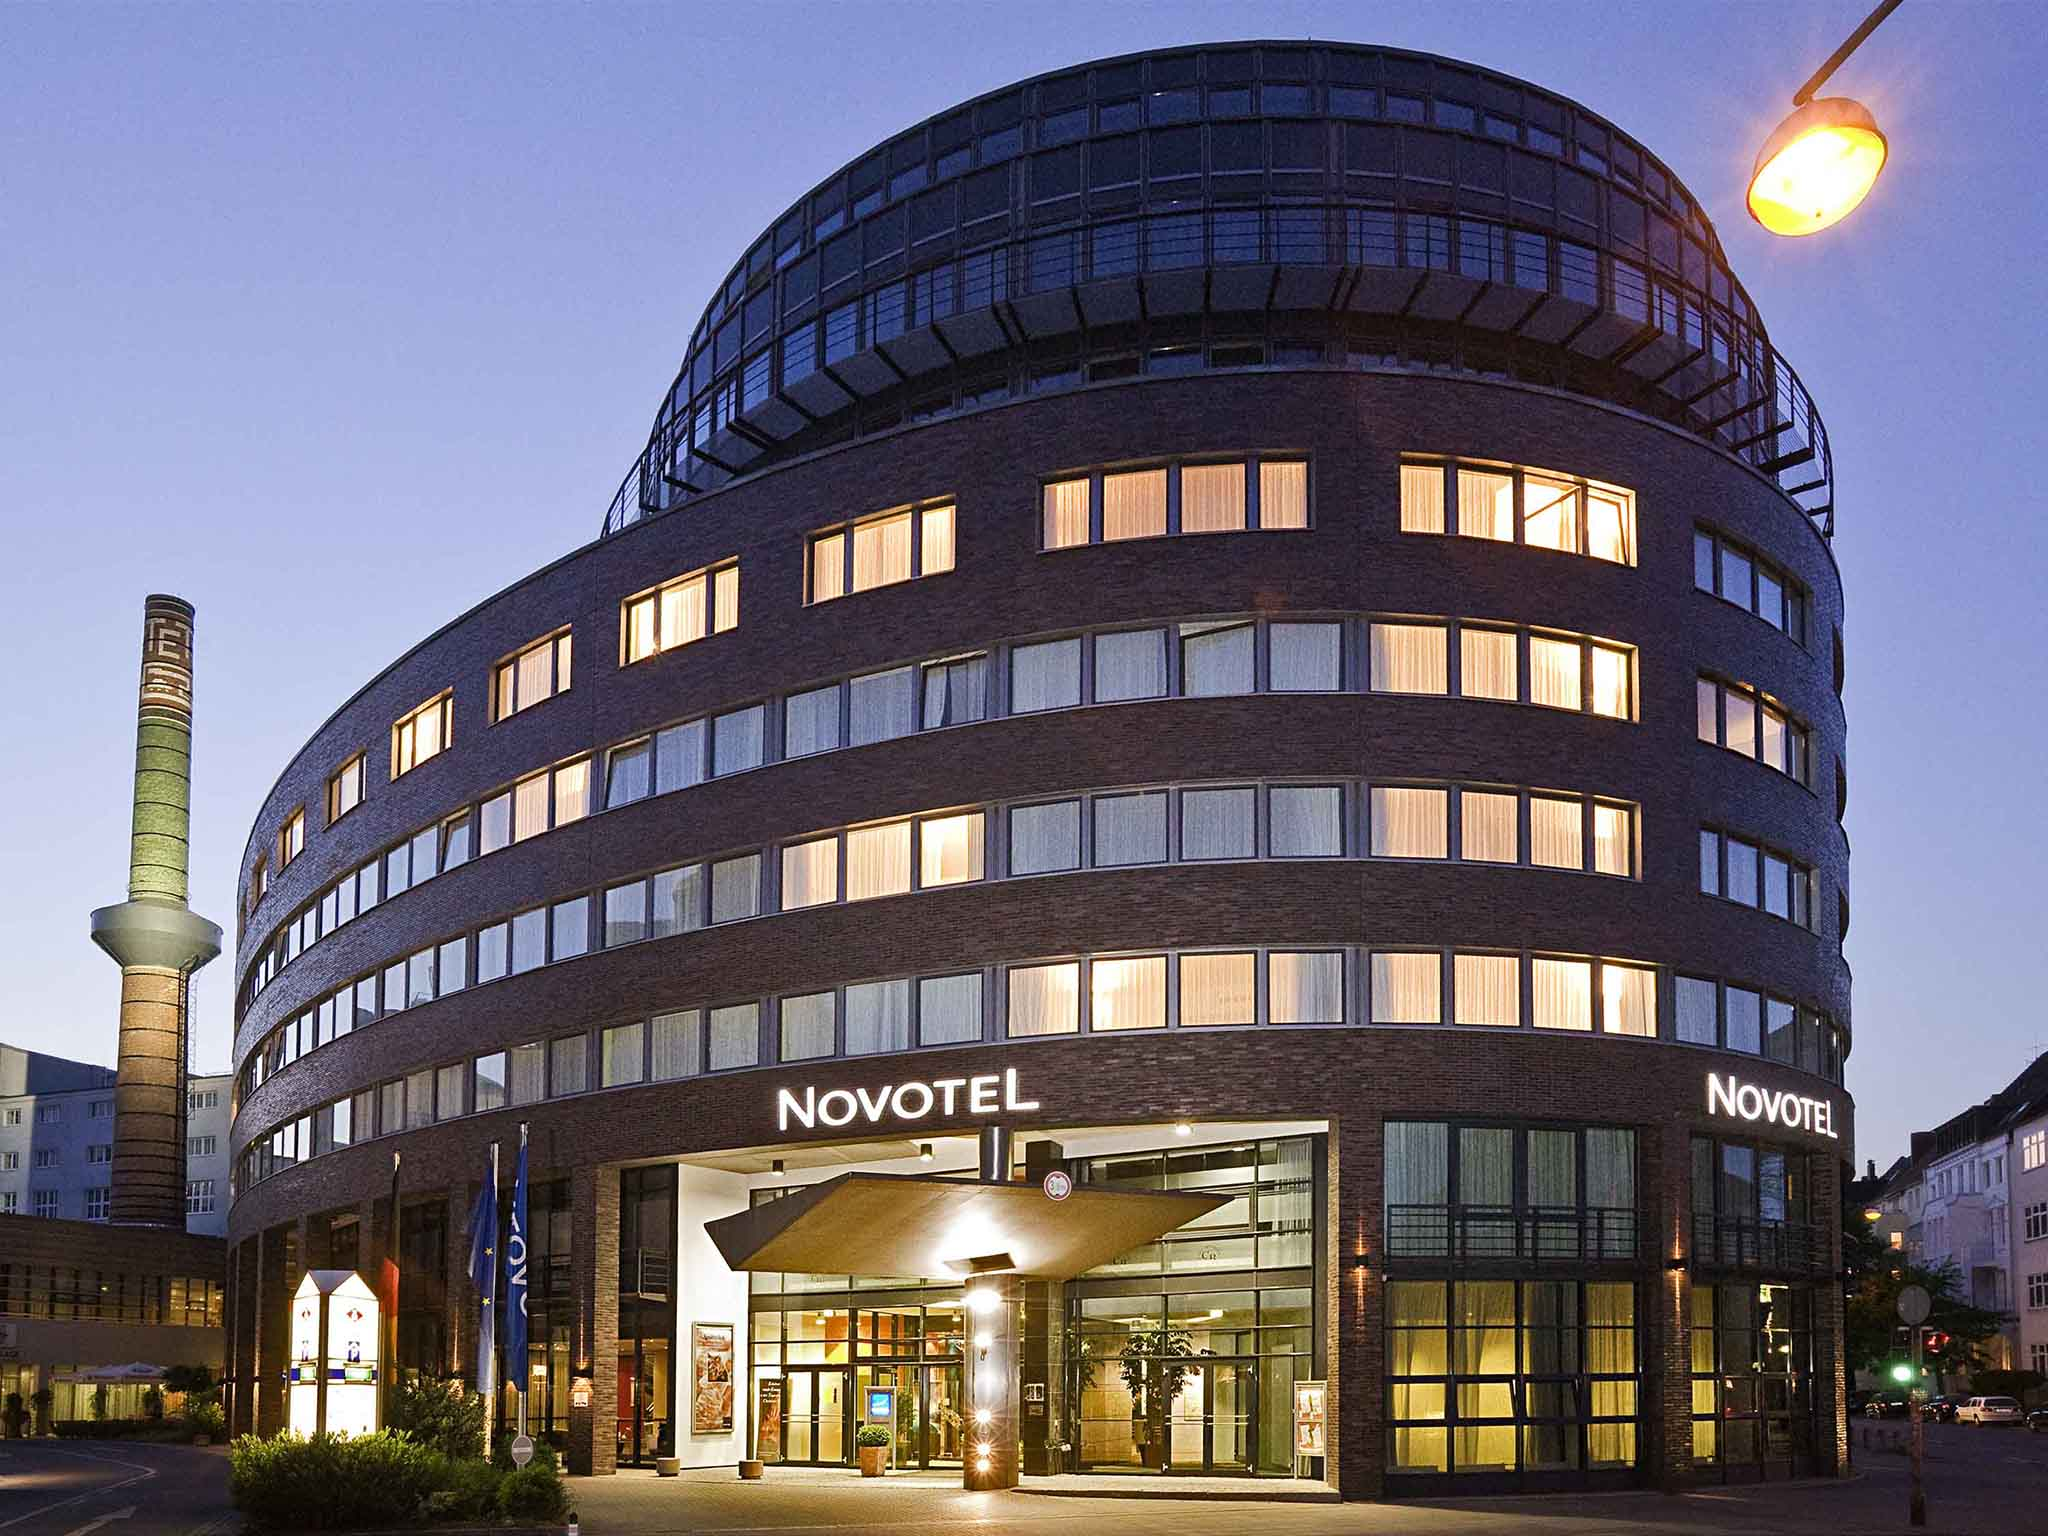 Hotell – Novotel Hannover